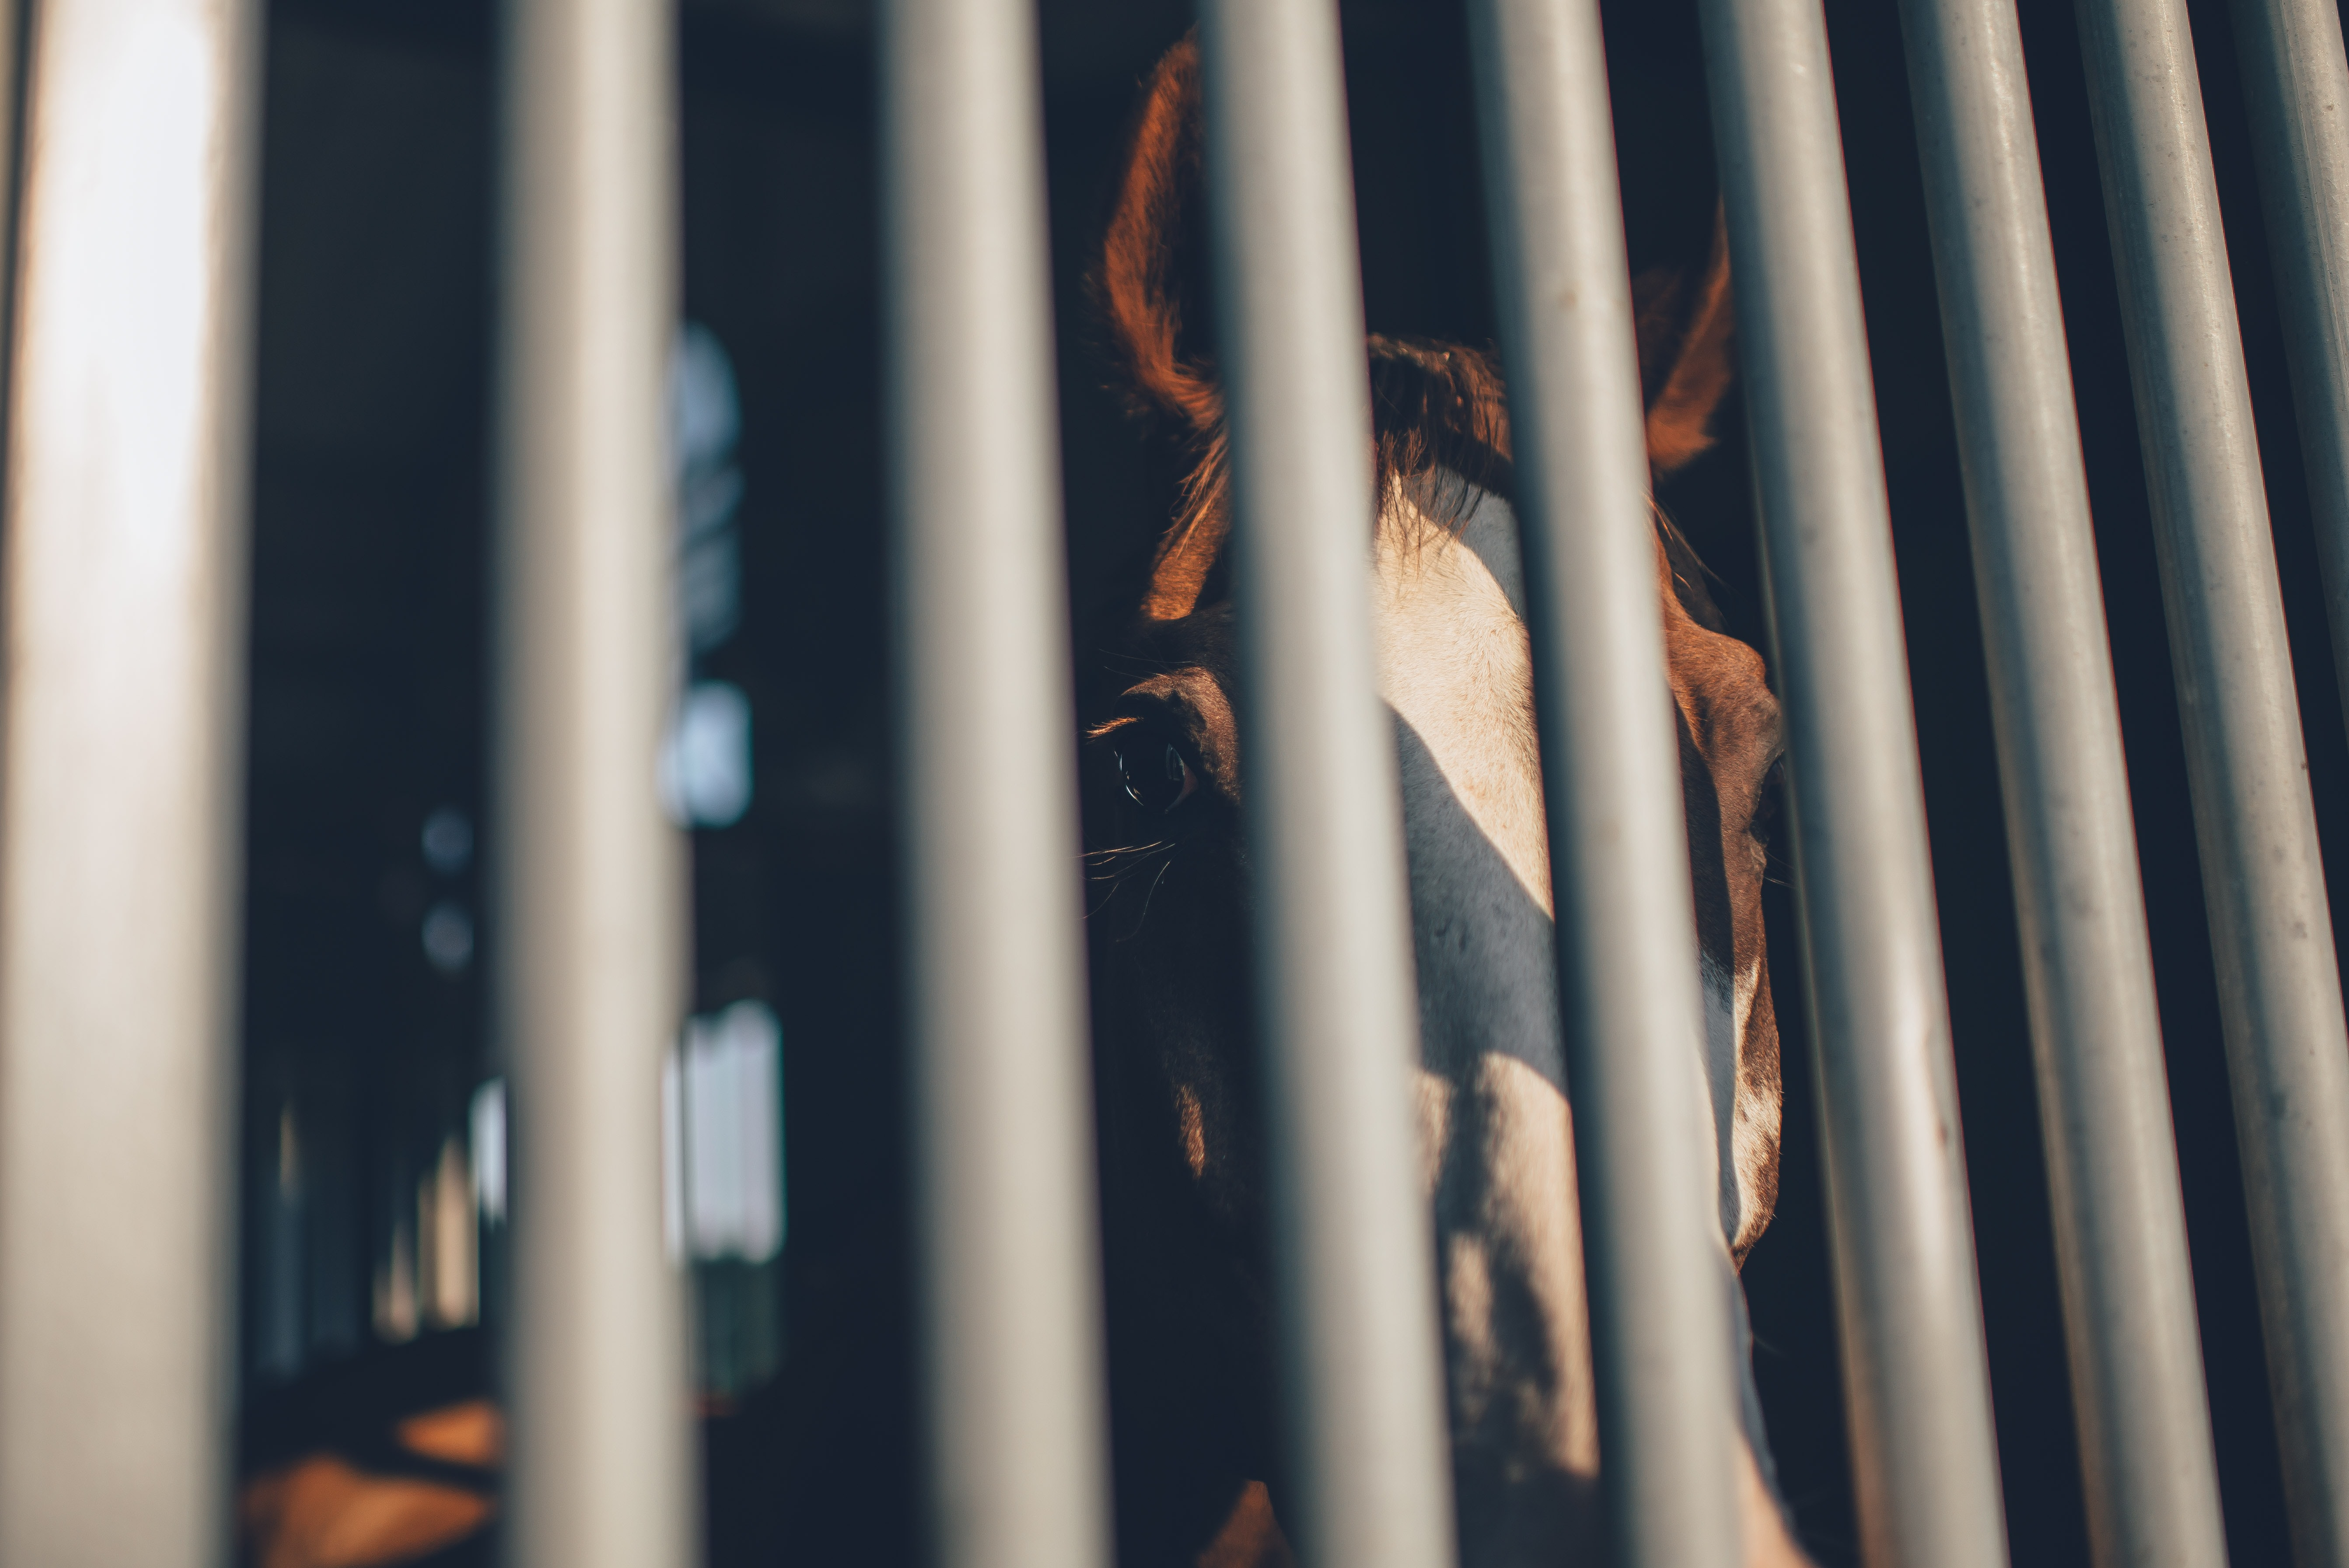 brown horse behind grey bars